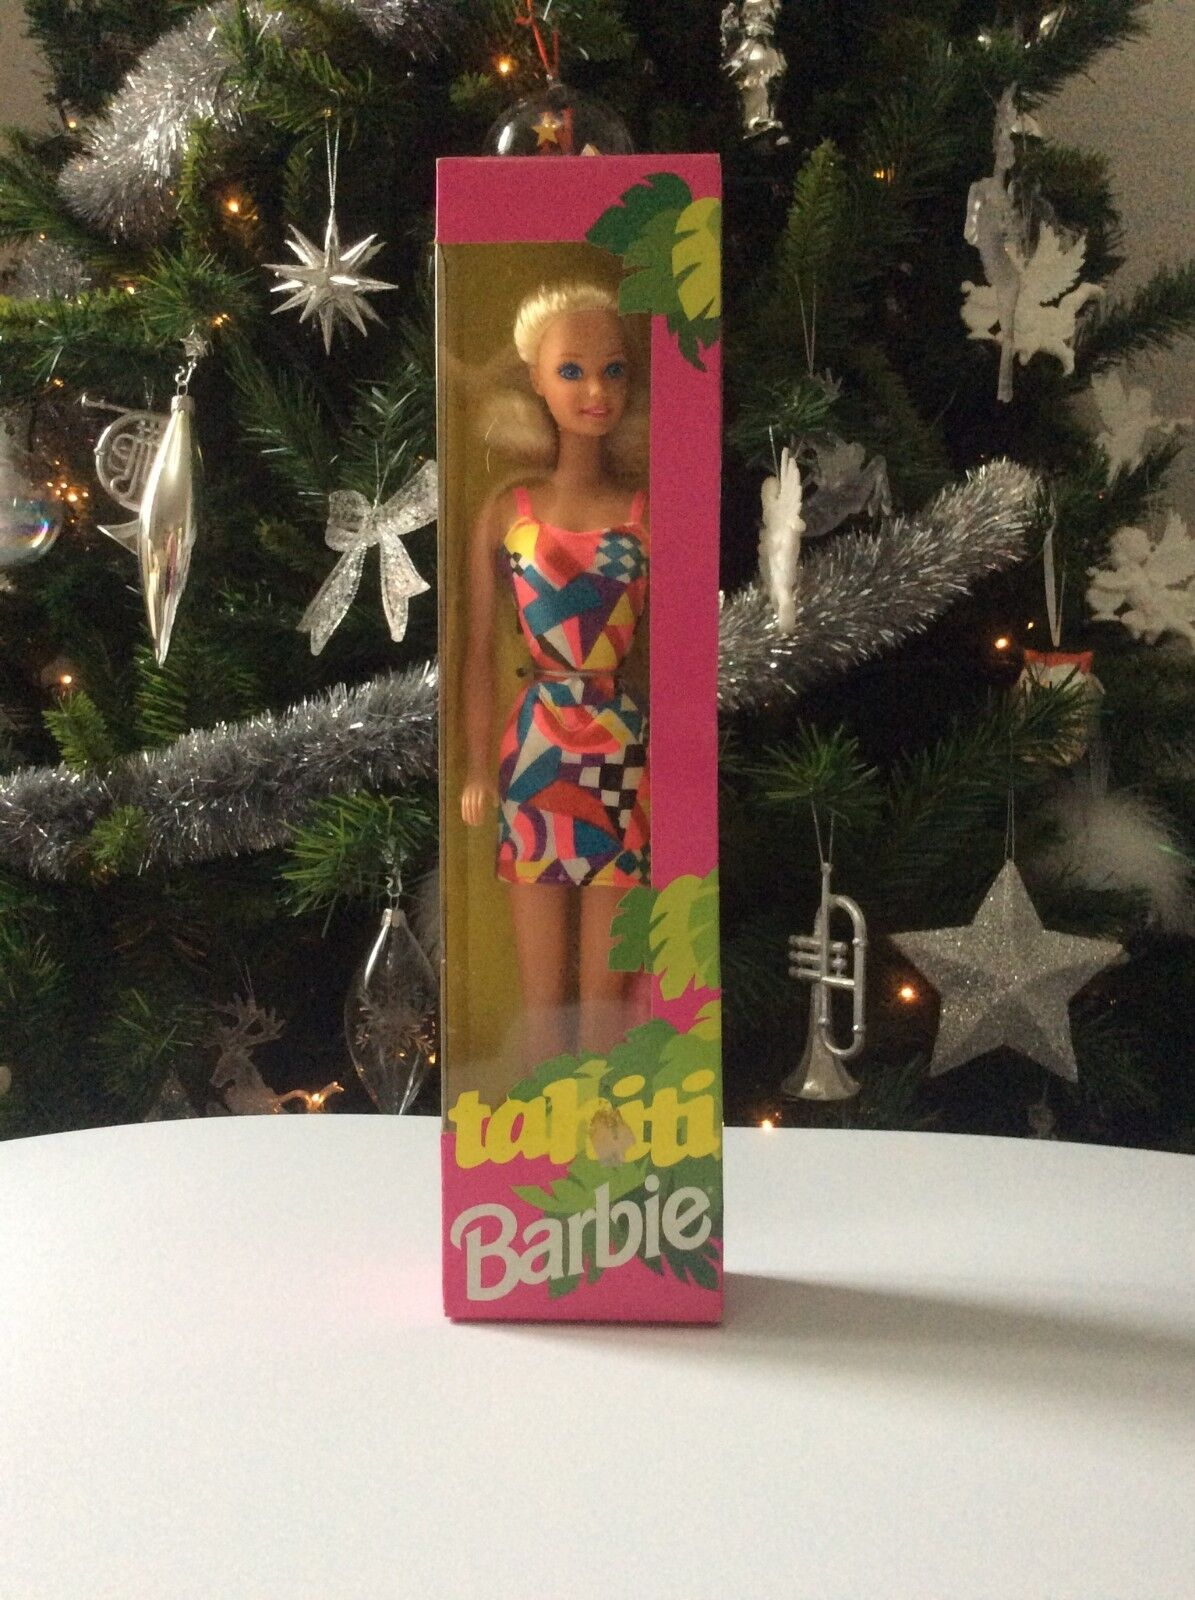 Barbie Tahiti Mattel 1992 Boîte d'origine Jamais Ouverdee Neuve Dans Sa Boite